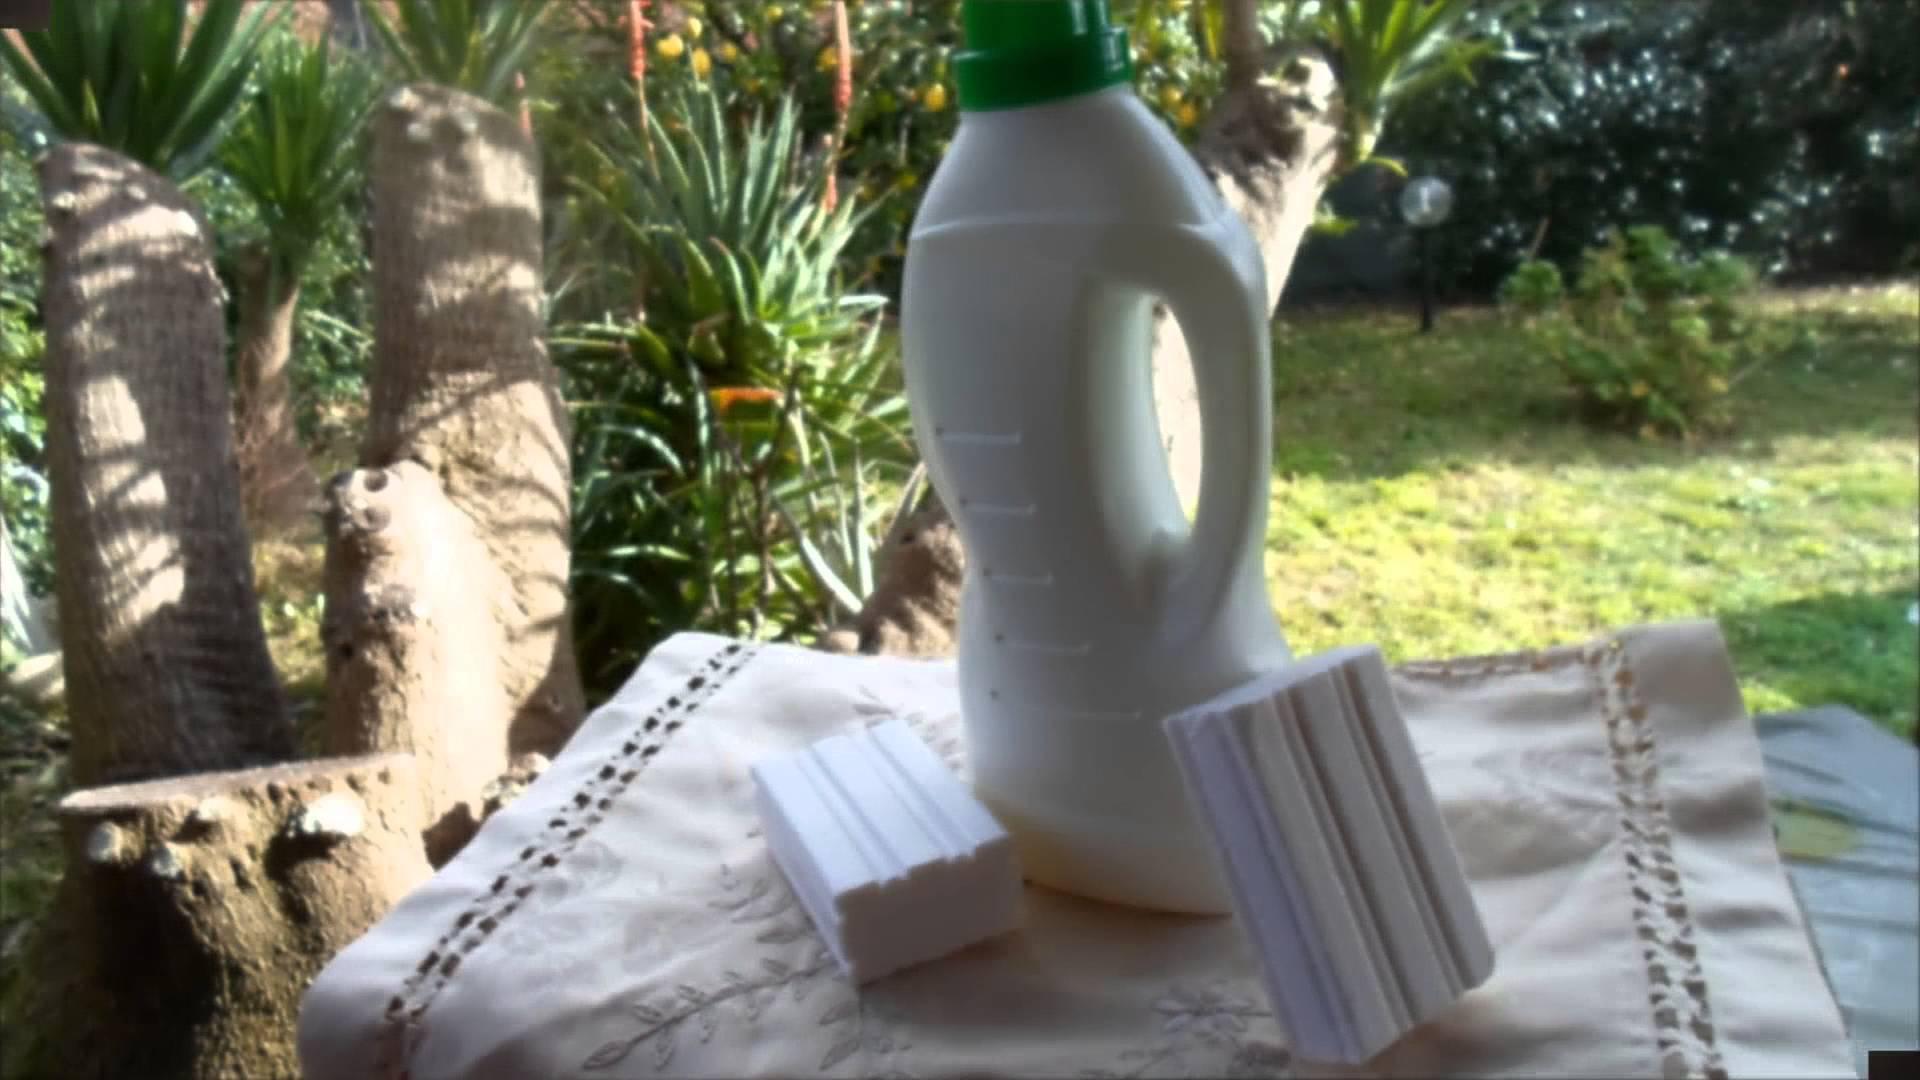 Come risparmiare sui detersivi - Detersivi ecologici fatti in casa ...